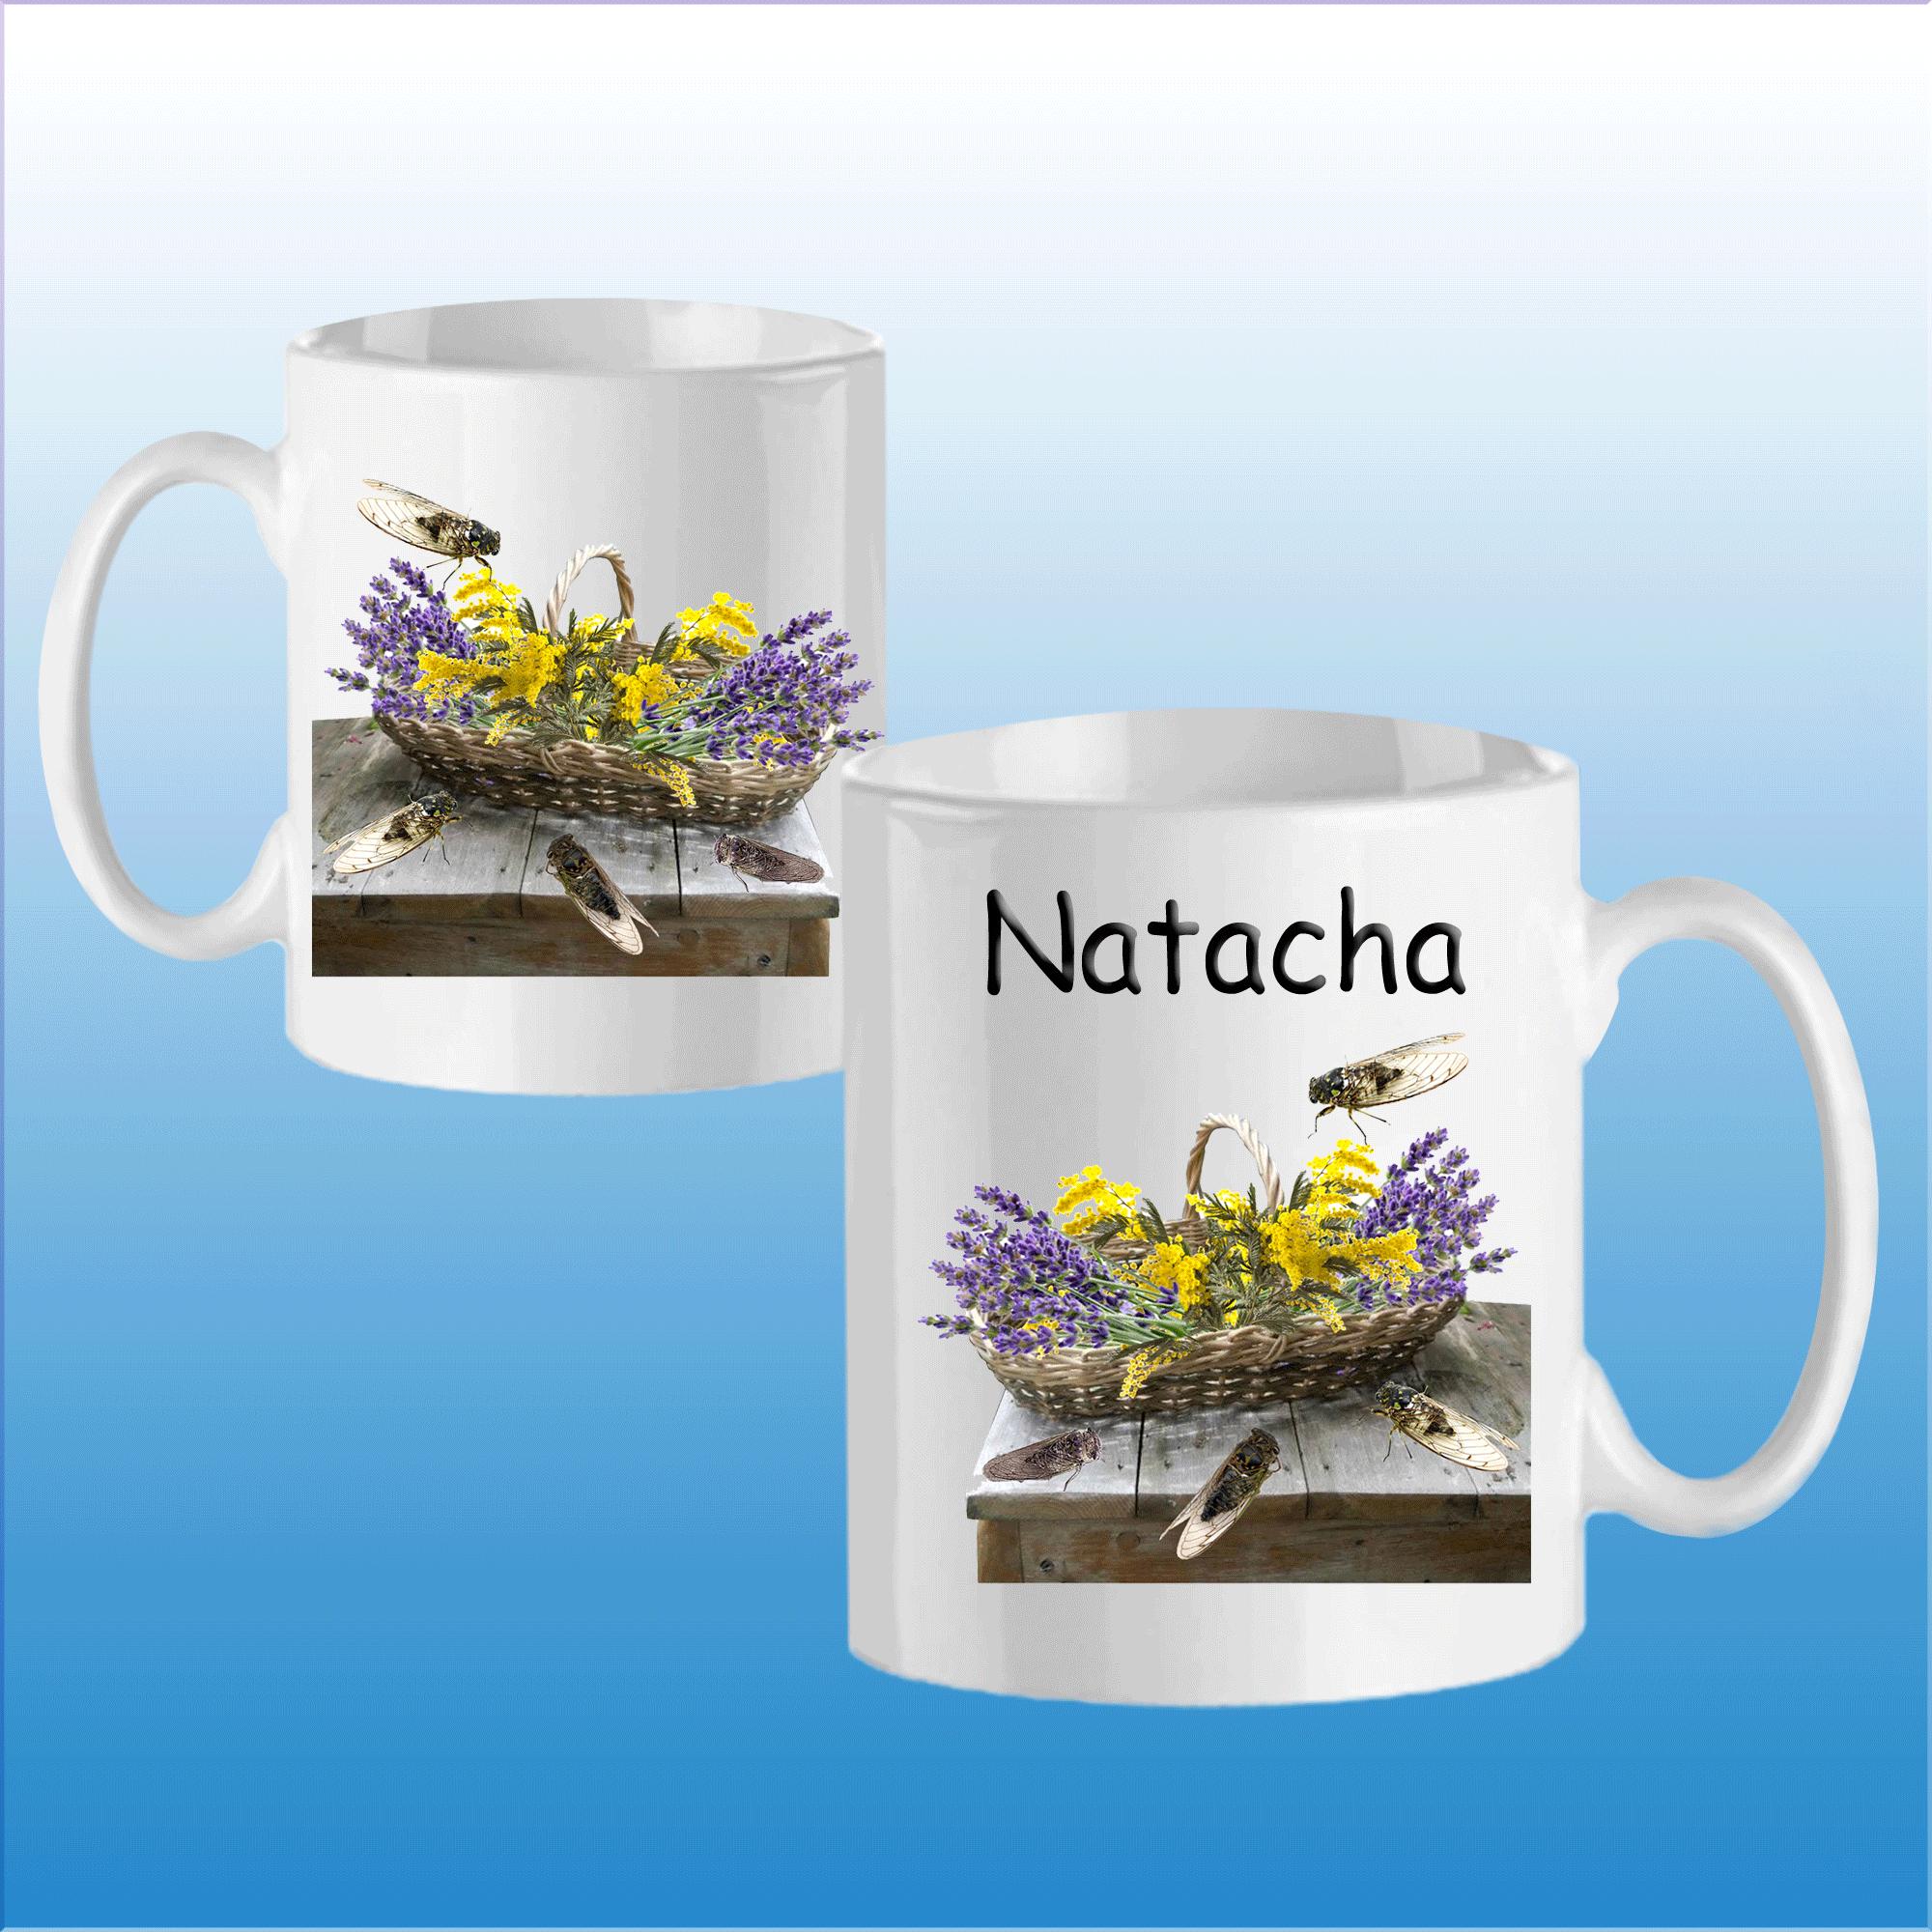 mug-provence-prenom-personnalisable-personnalisation-personnalise-blanc-ceramique-tasse-lavande-cigale-panier-genet-natacha